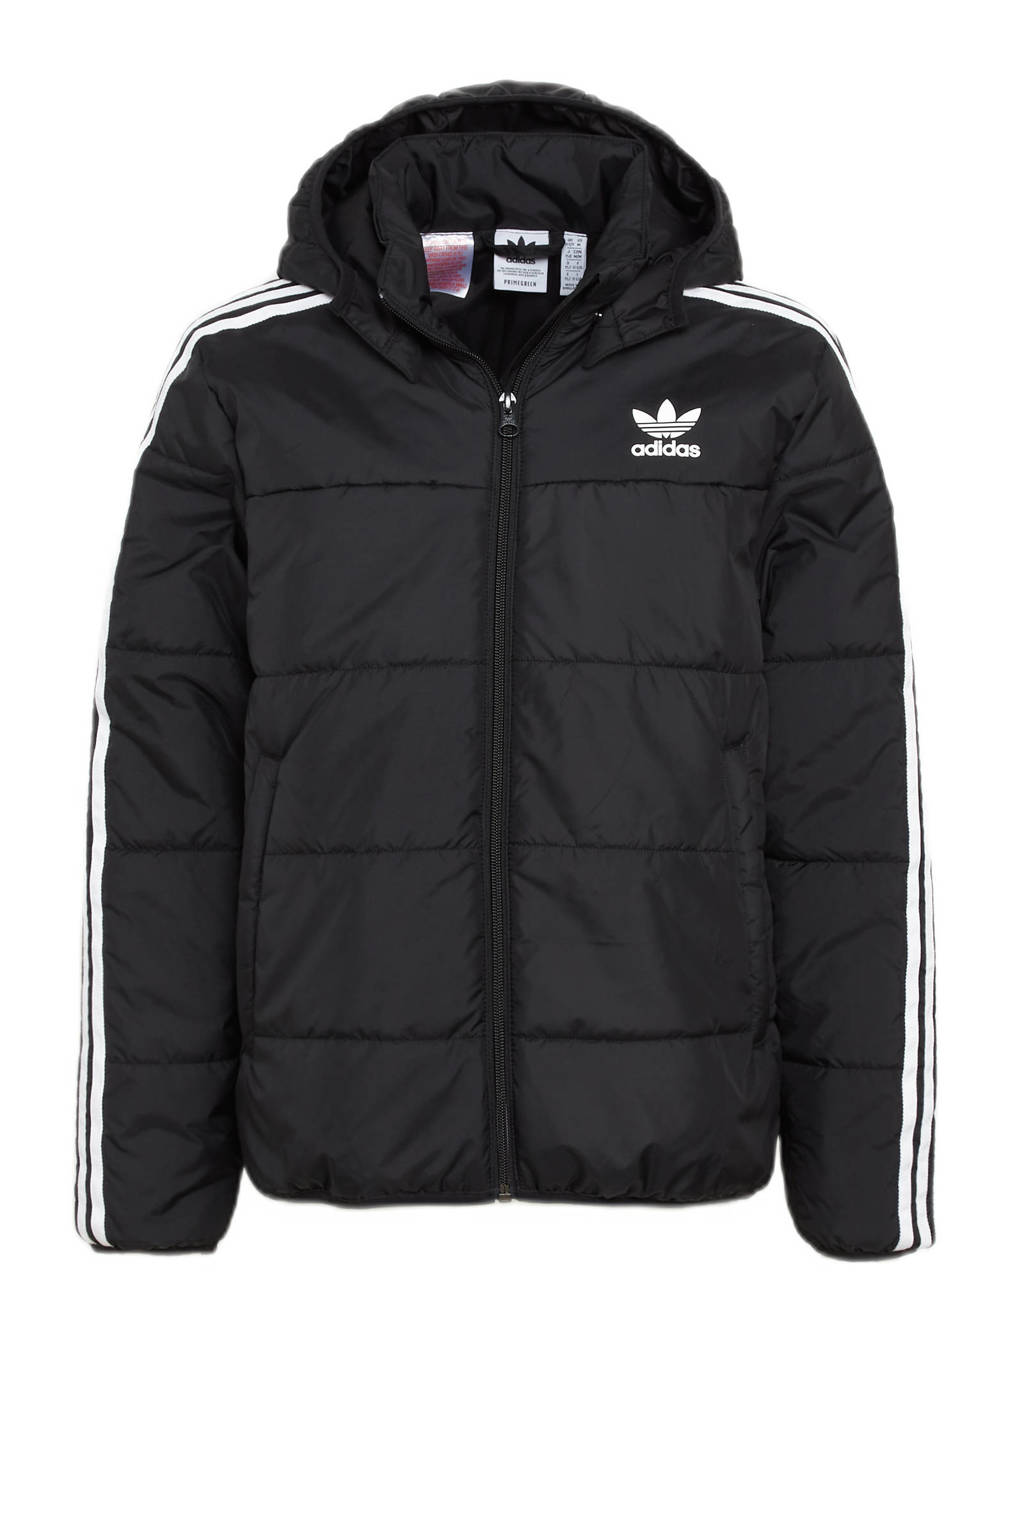 adidas Originals Adicolor jas zwart/wit, Zwart/wit